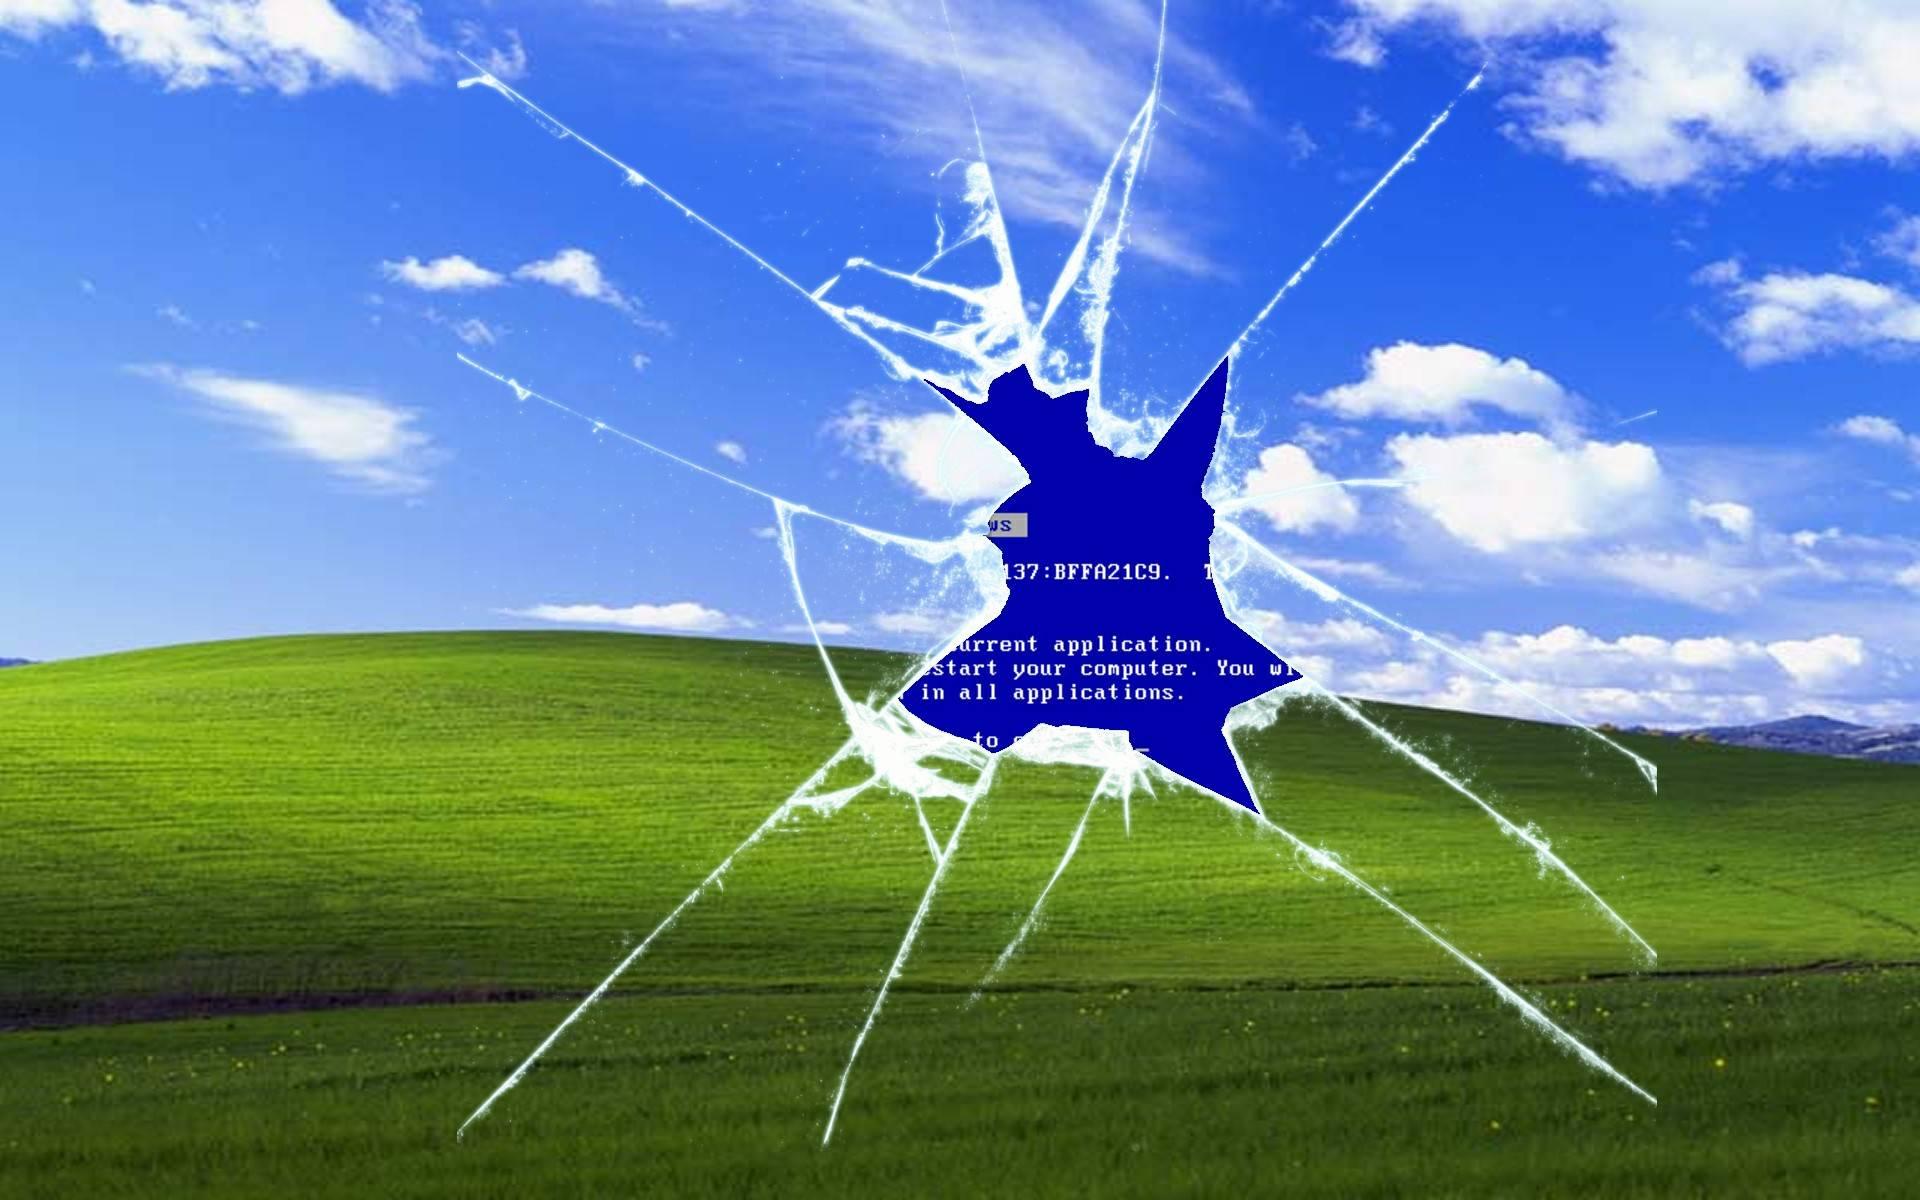 Windows xp confirmation id code list